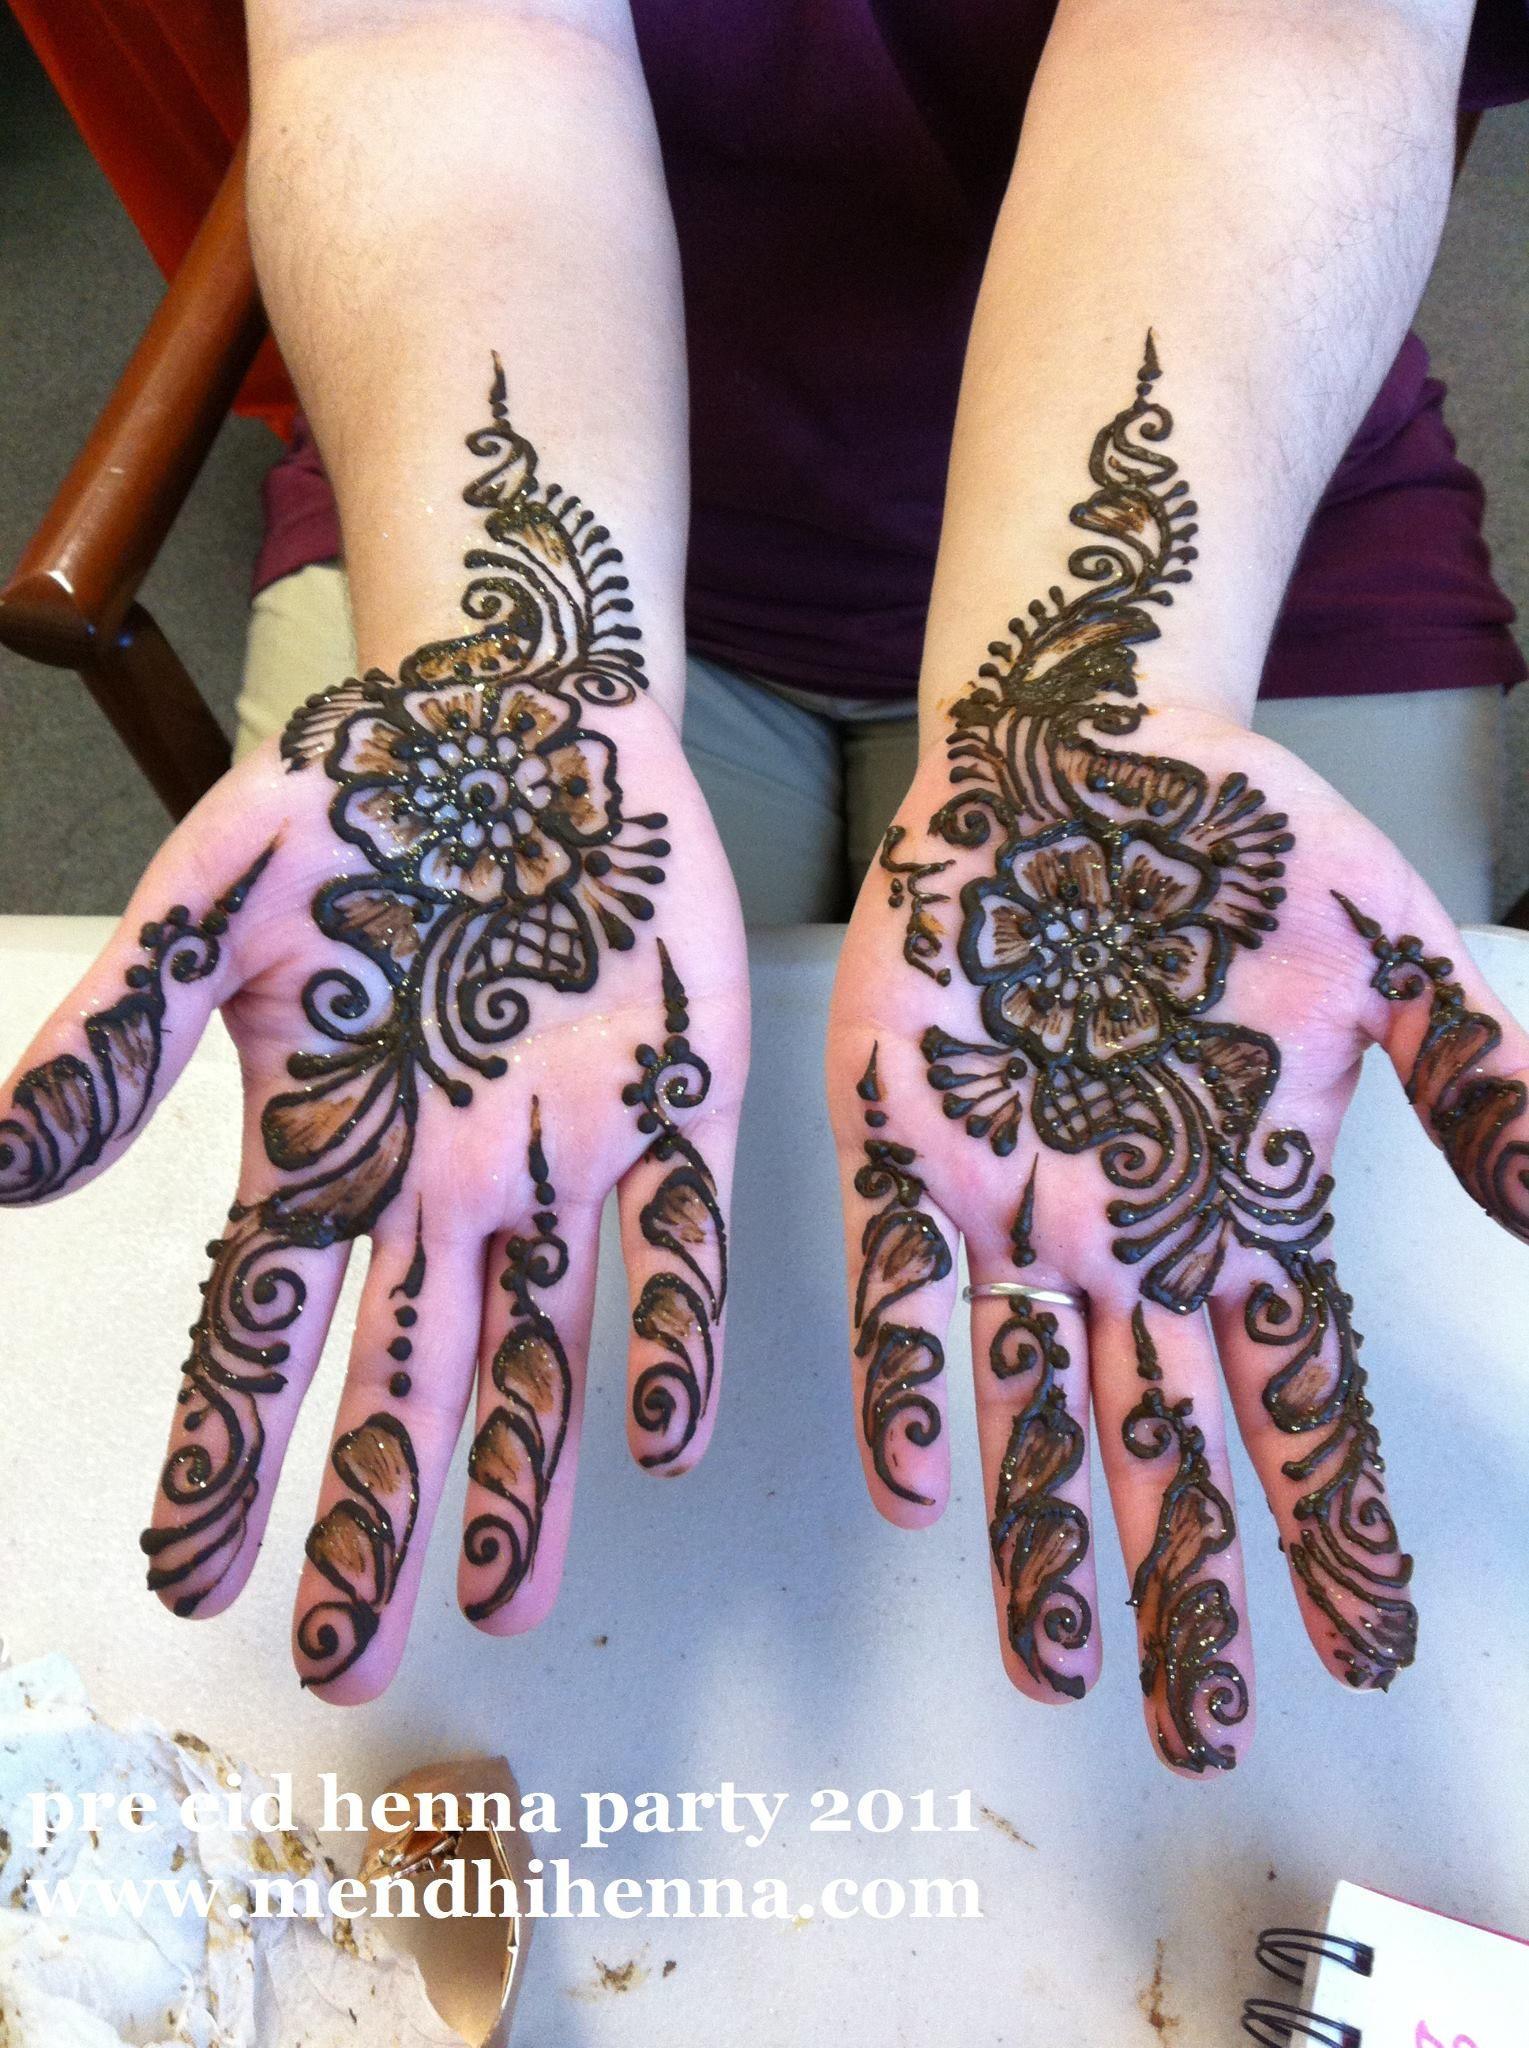 kerala hindu muslim christian matrimony marriage tattoo design bild. Black Bedroom Furniture Sets. Home Design Ideas